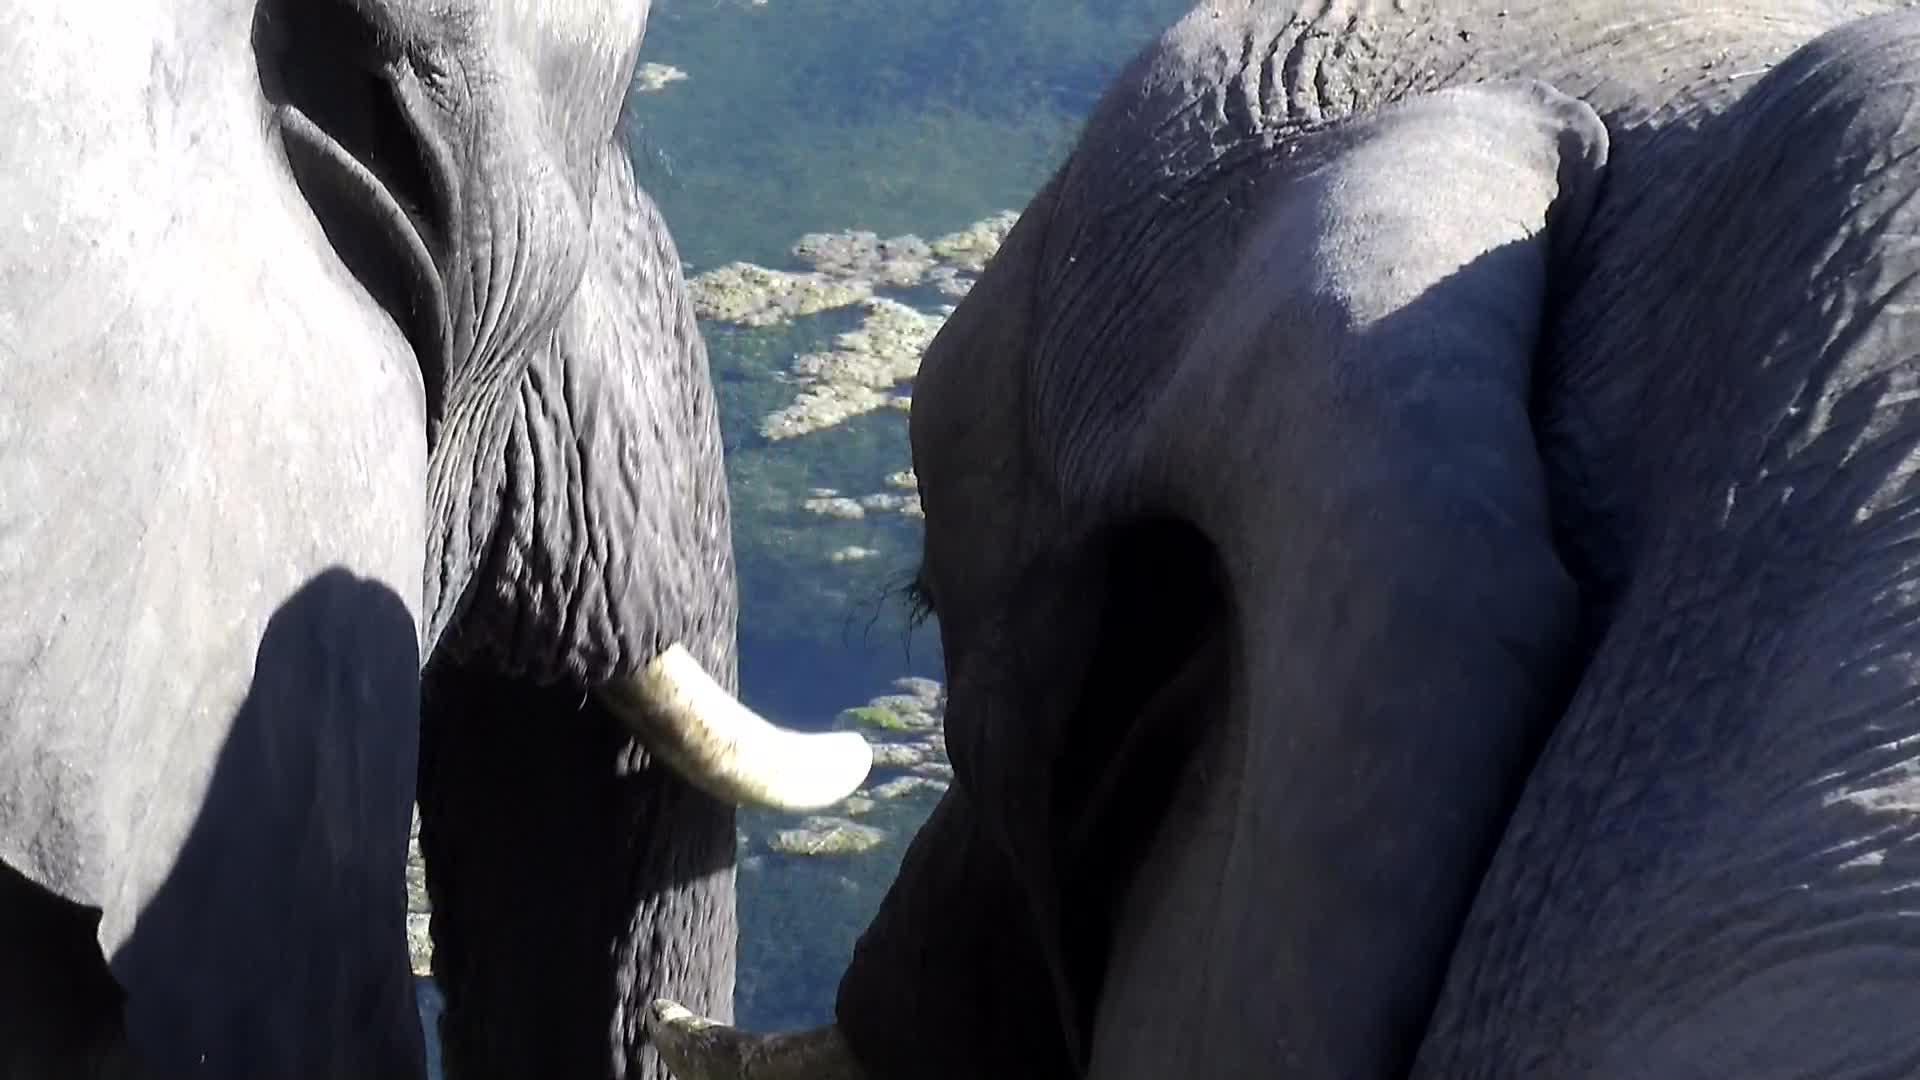 VIDEO: Elephants up close